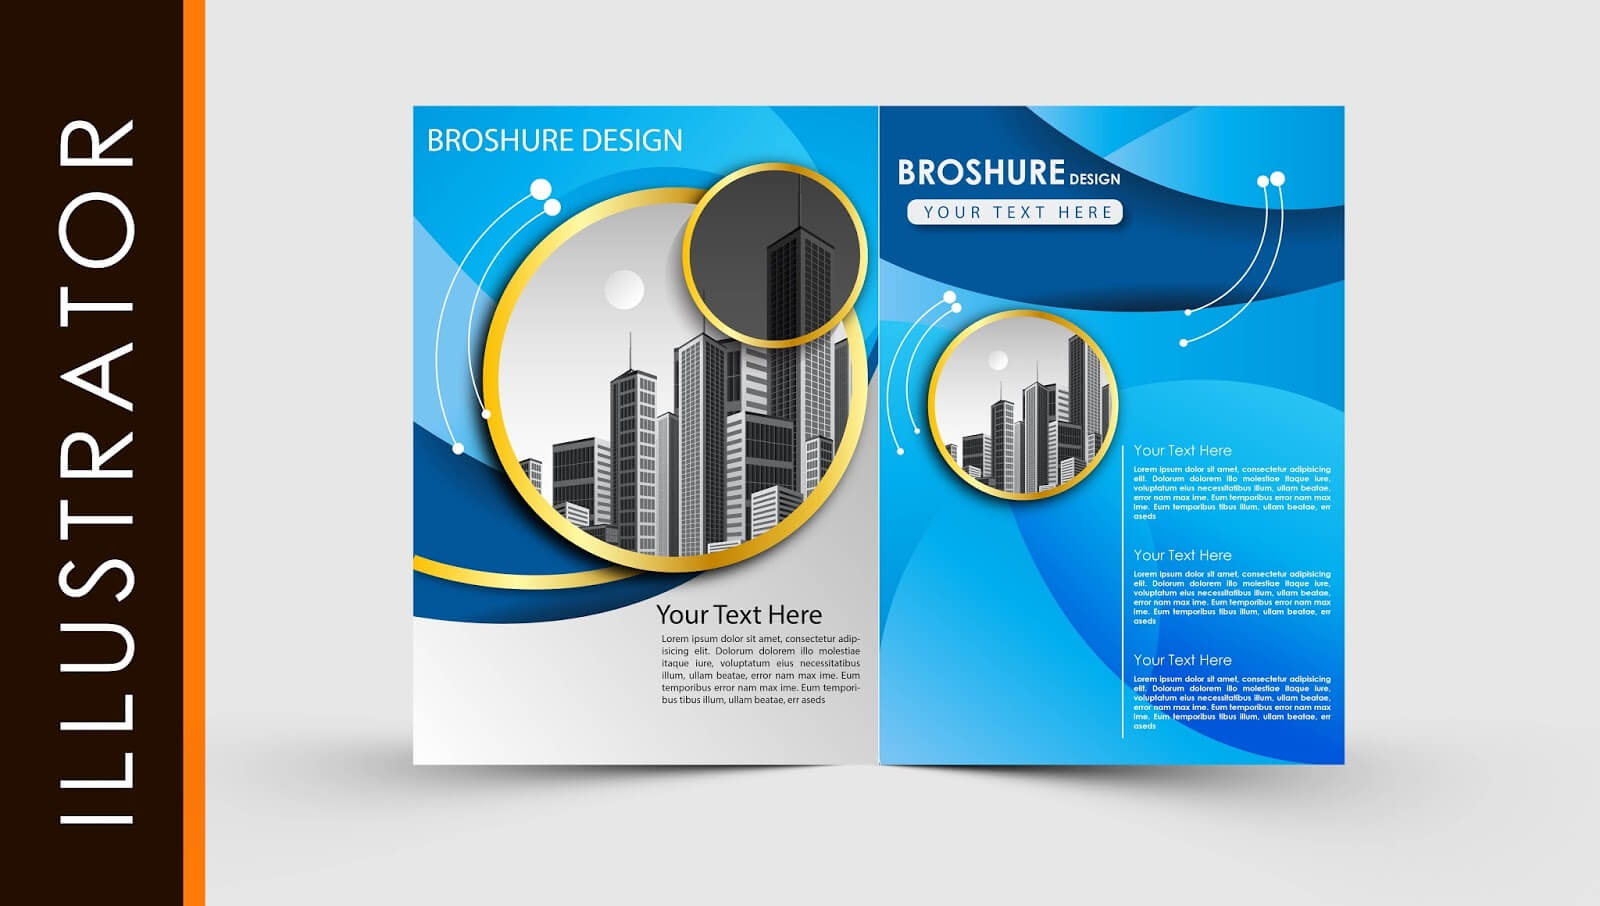 Free Download Adobe Illustrator Template Brochure Two Fold For Ai Brochure Templates Free Download